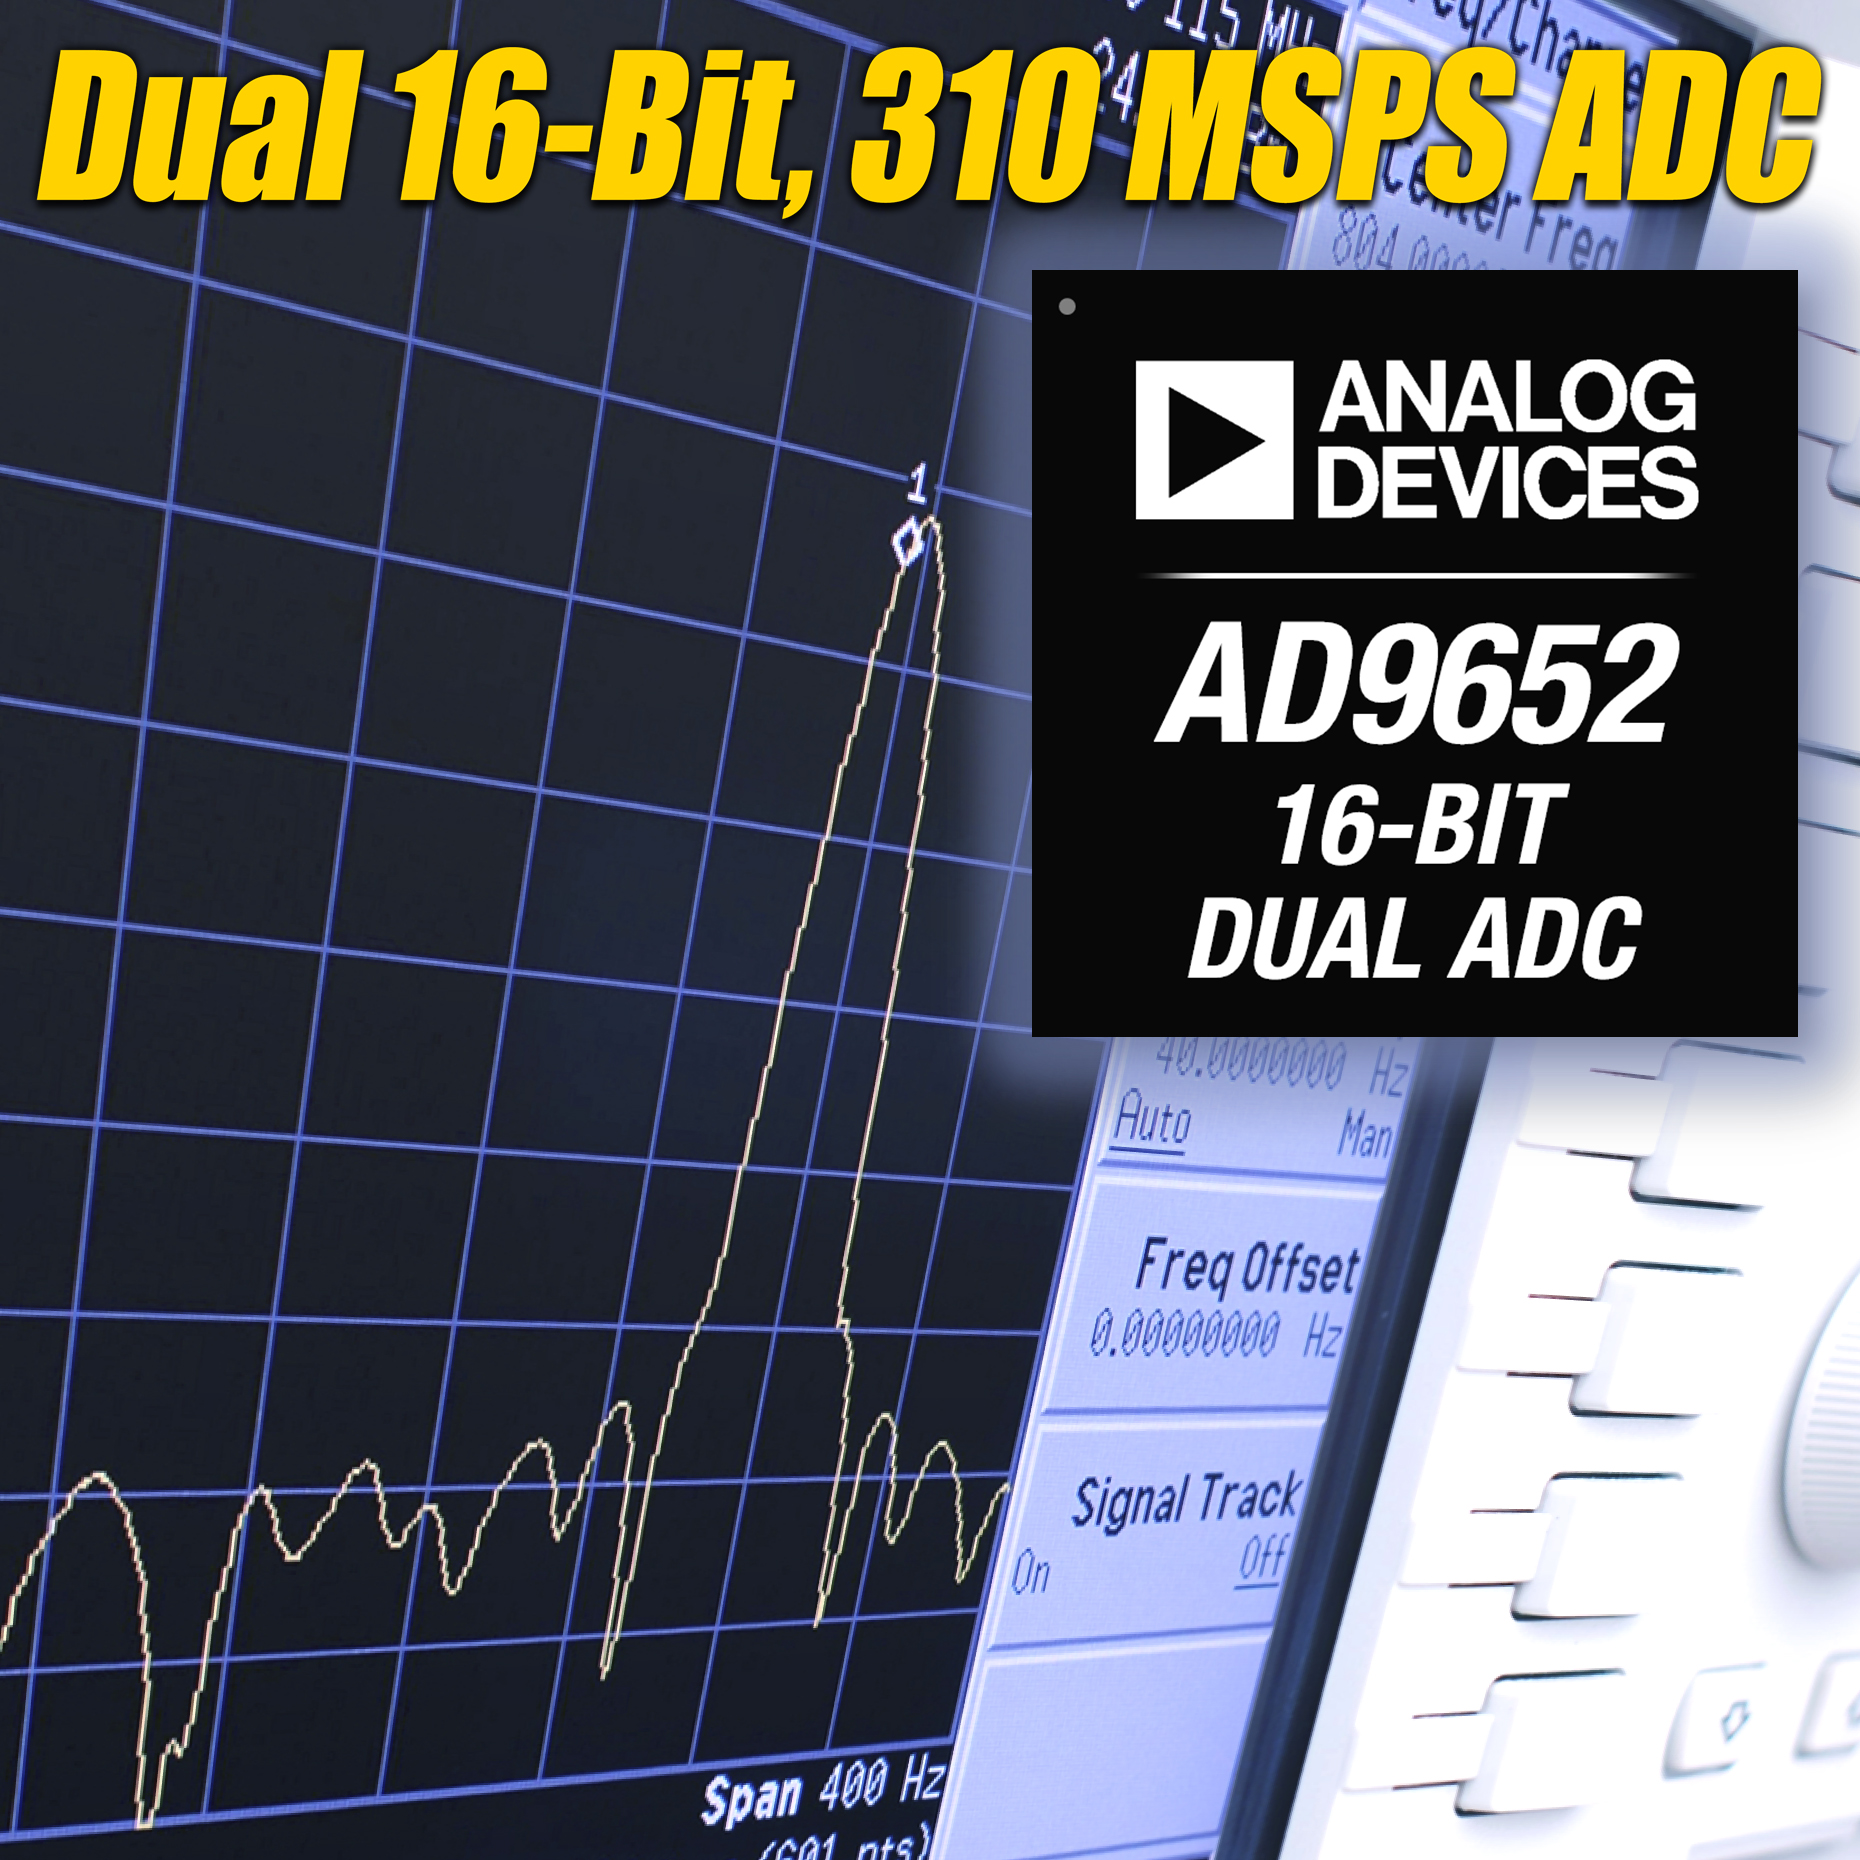 ADI推出16位、310 MSPS、双通道模数转换器AD9652